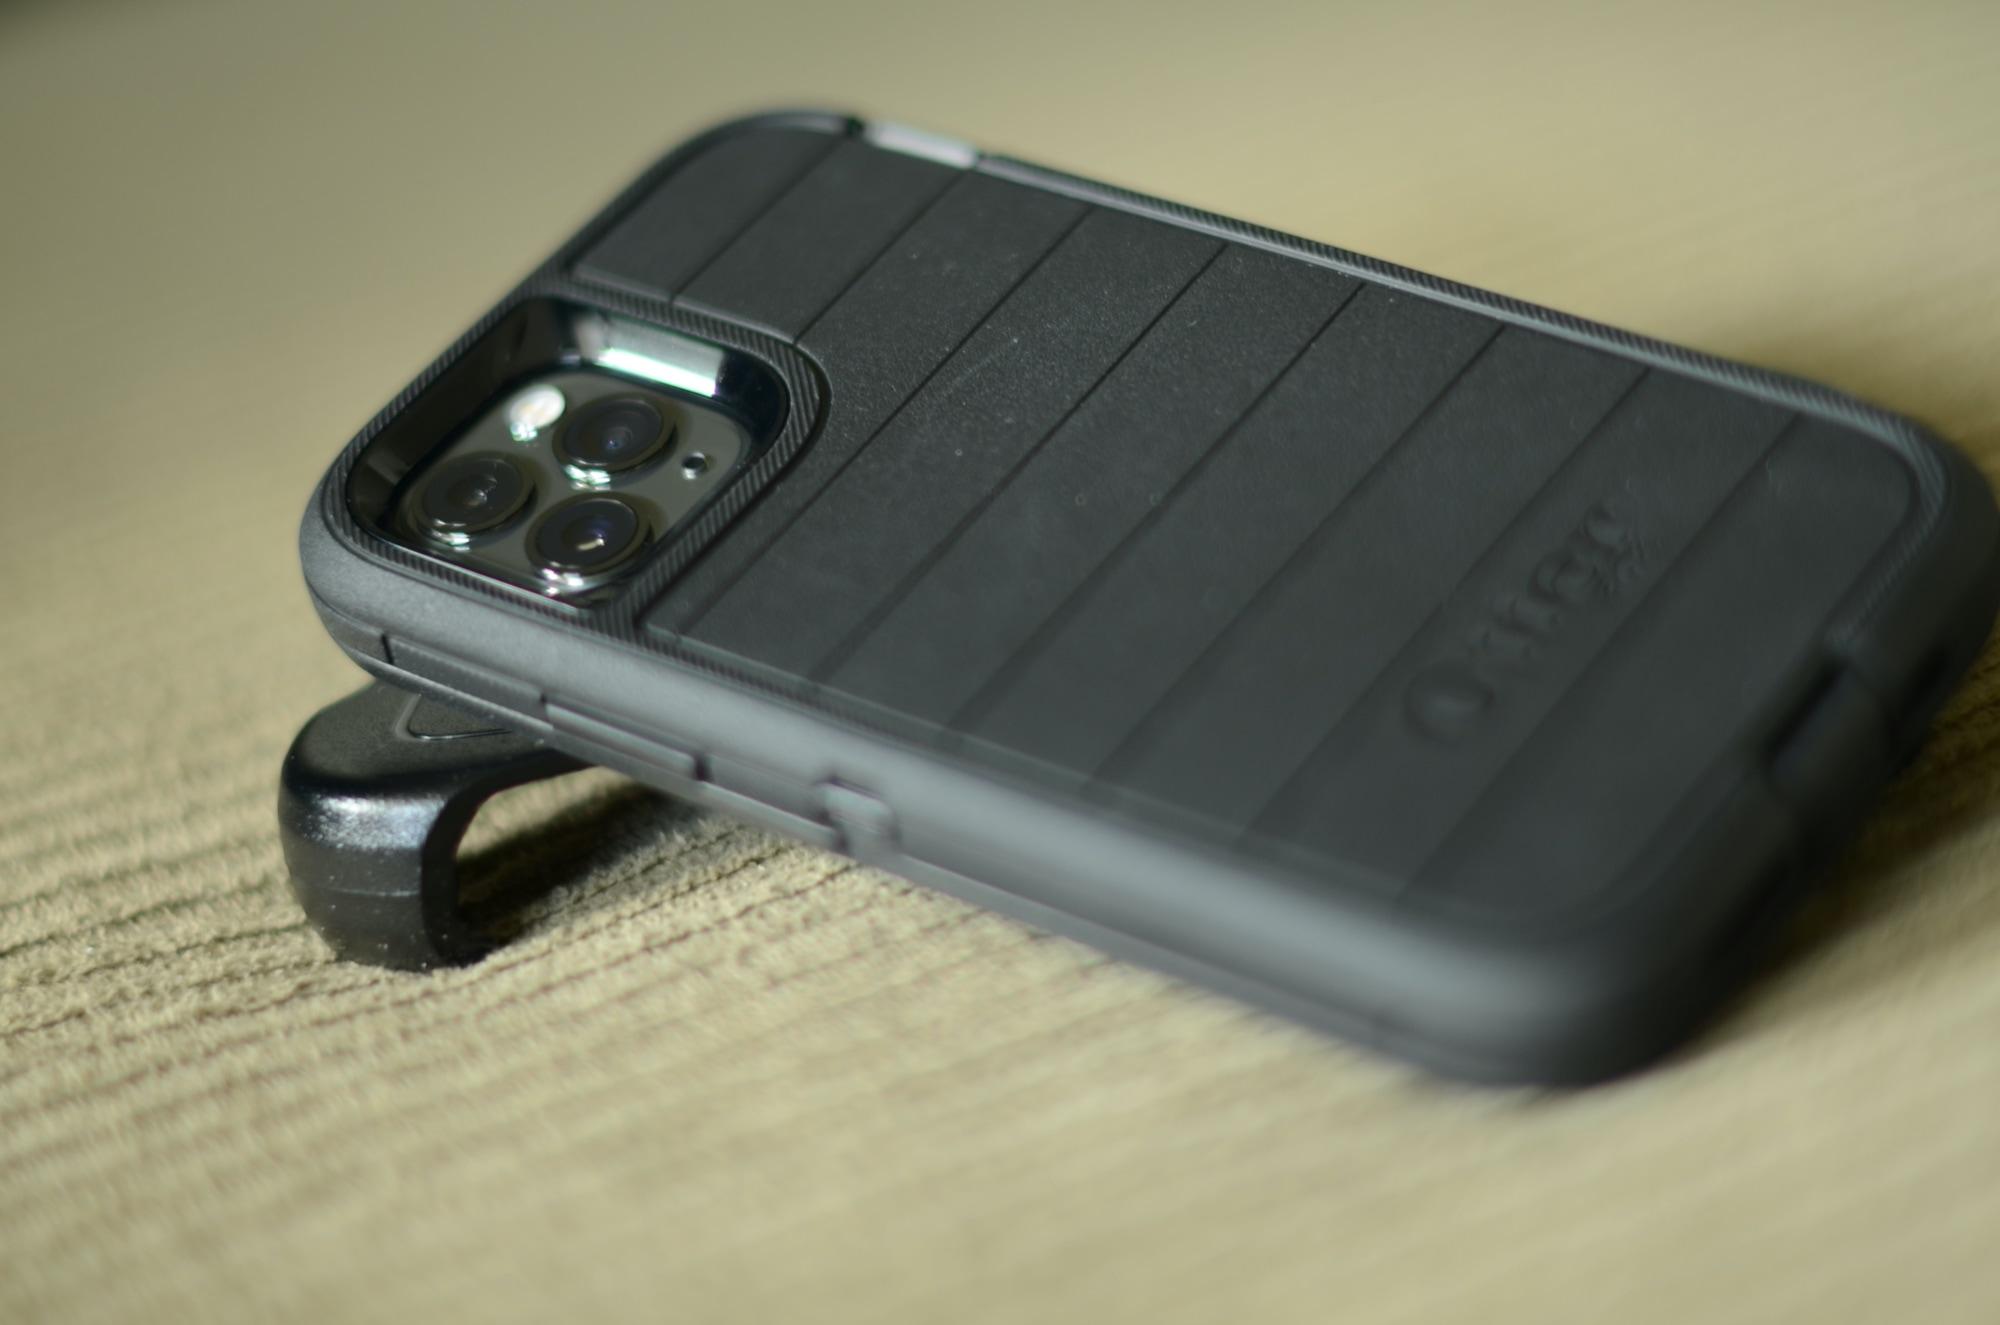 Otterbox Defender Pro iPhone 11 Pro case